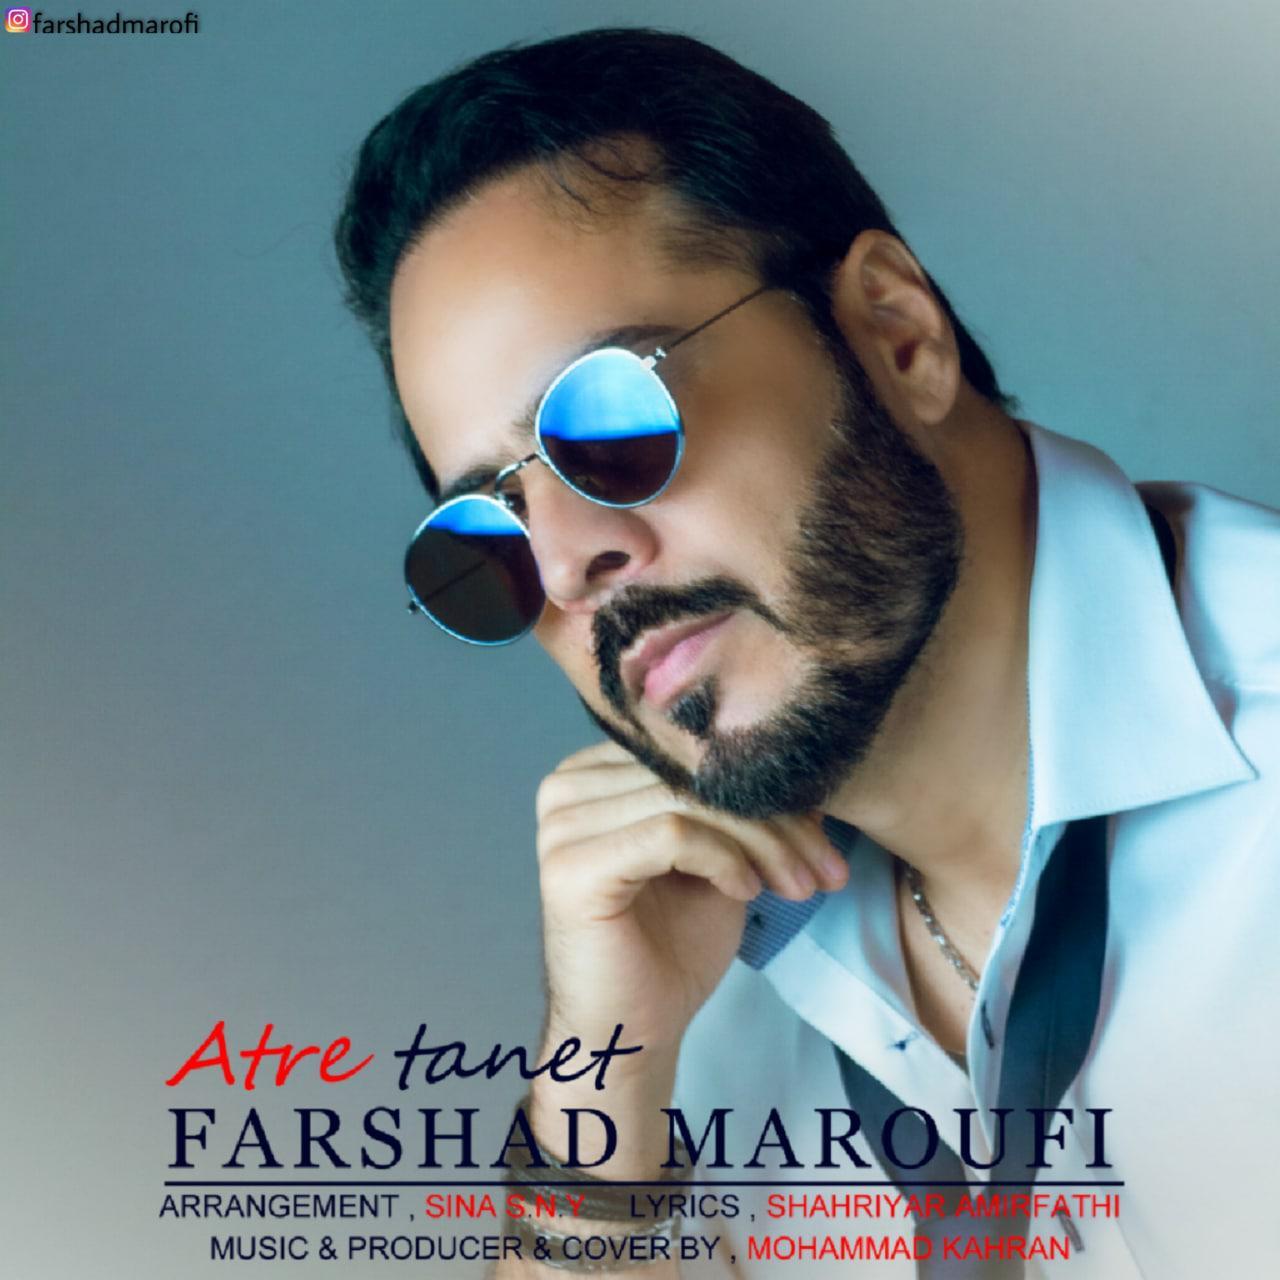 Farshad Maroufi – Atre Tanet